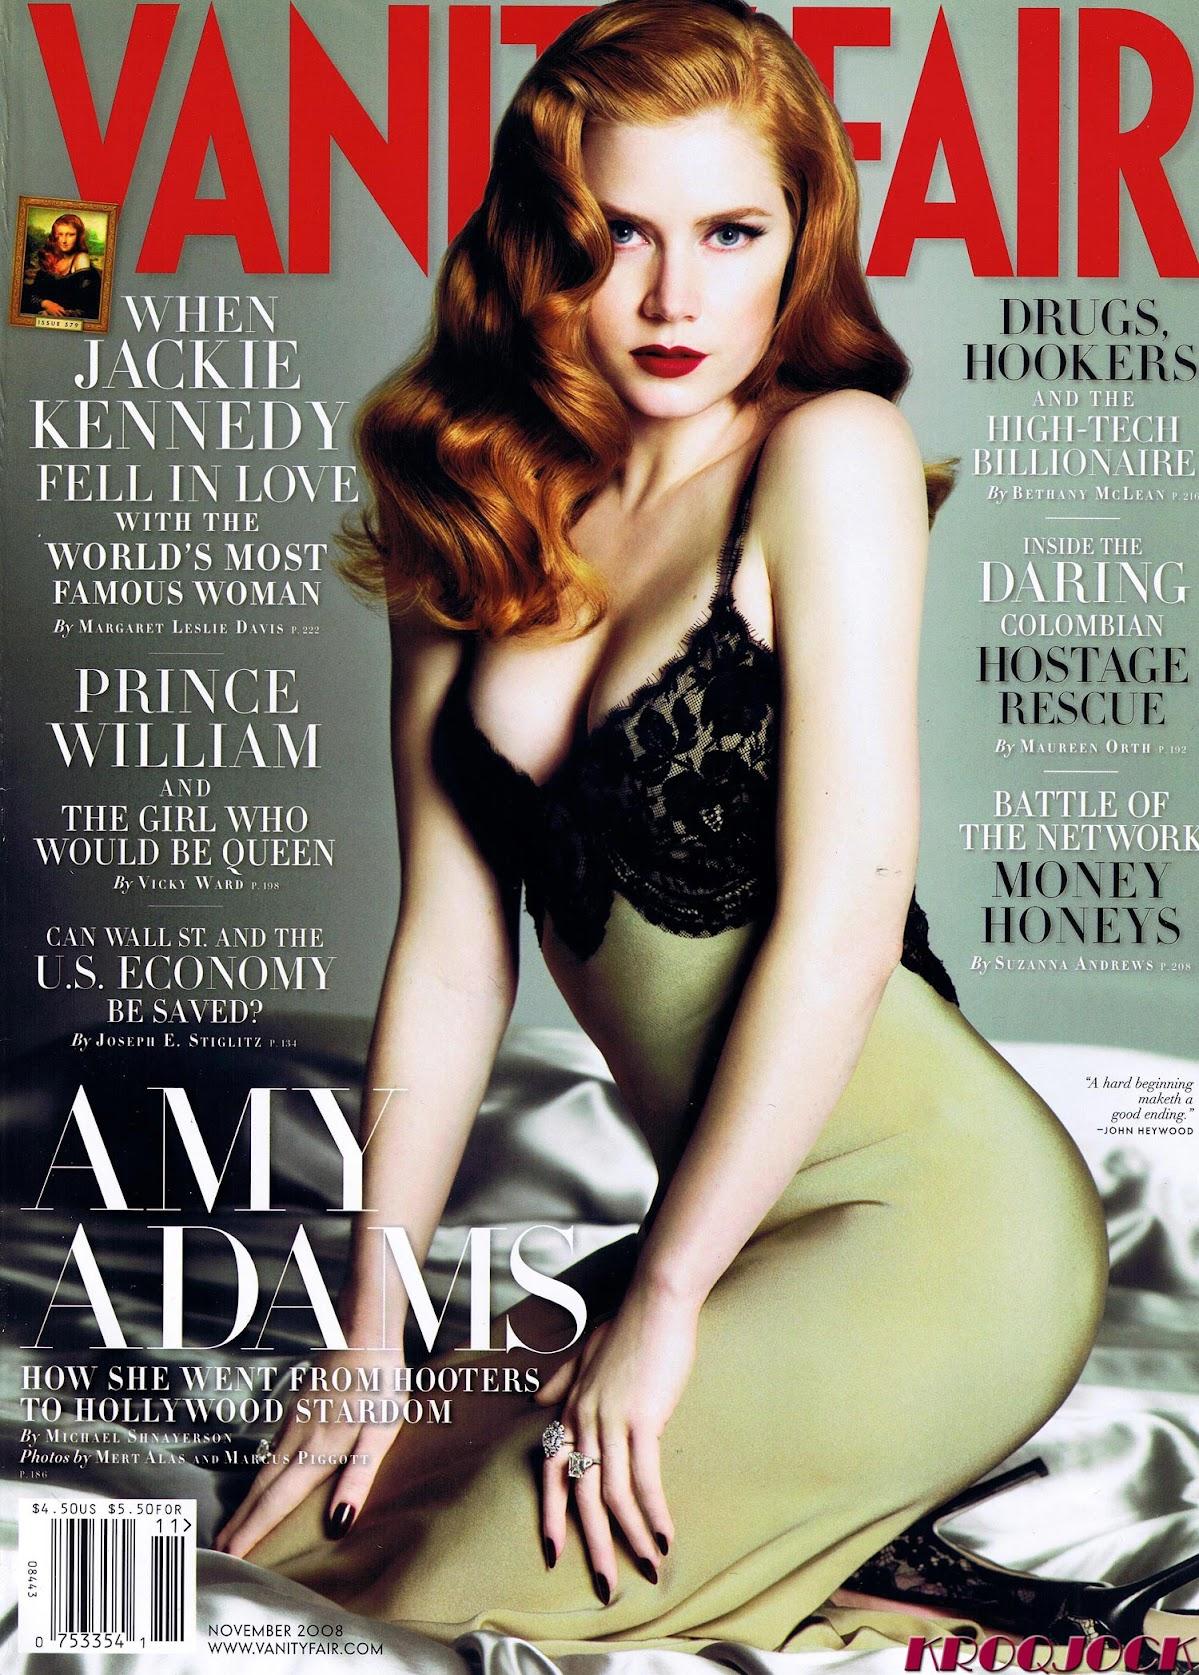 http://4.bp.blogspot.com/-3V4uBcpjukA/TxgqEmGbynI/AAAAAAAABTs/qNOVW5QksYI/s1675/Amy-Adams-Vanity-fair-magazine-cover-1308340944.jpg